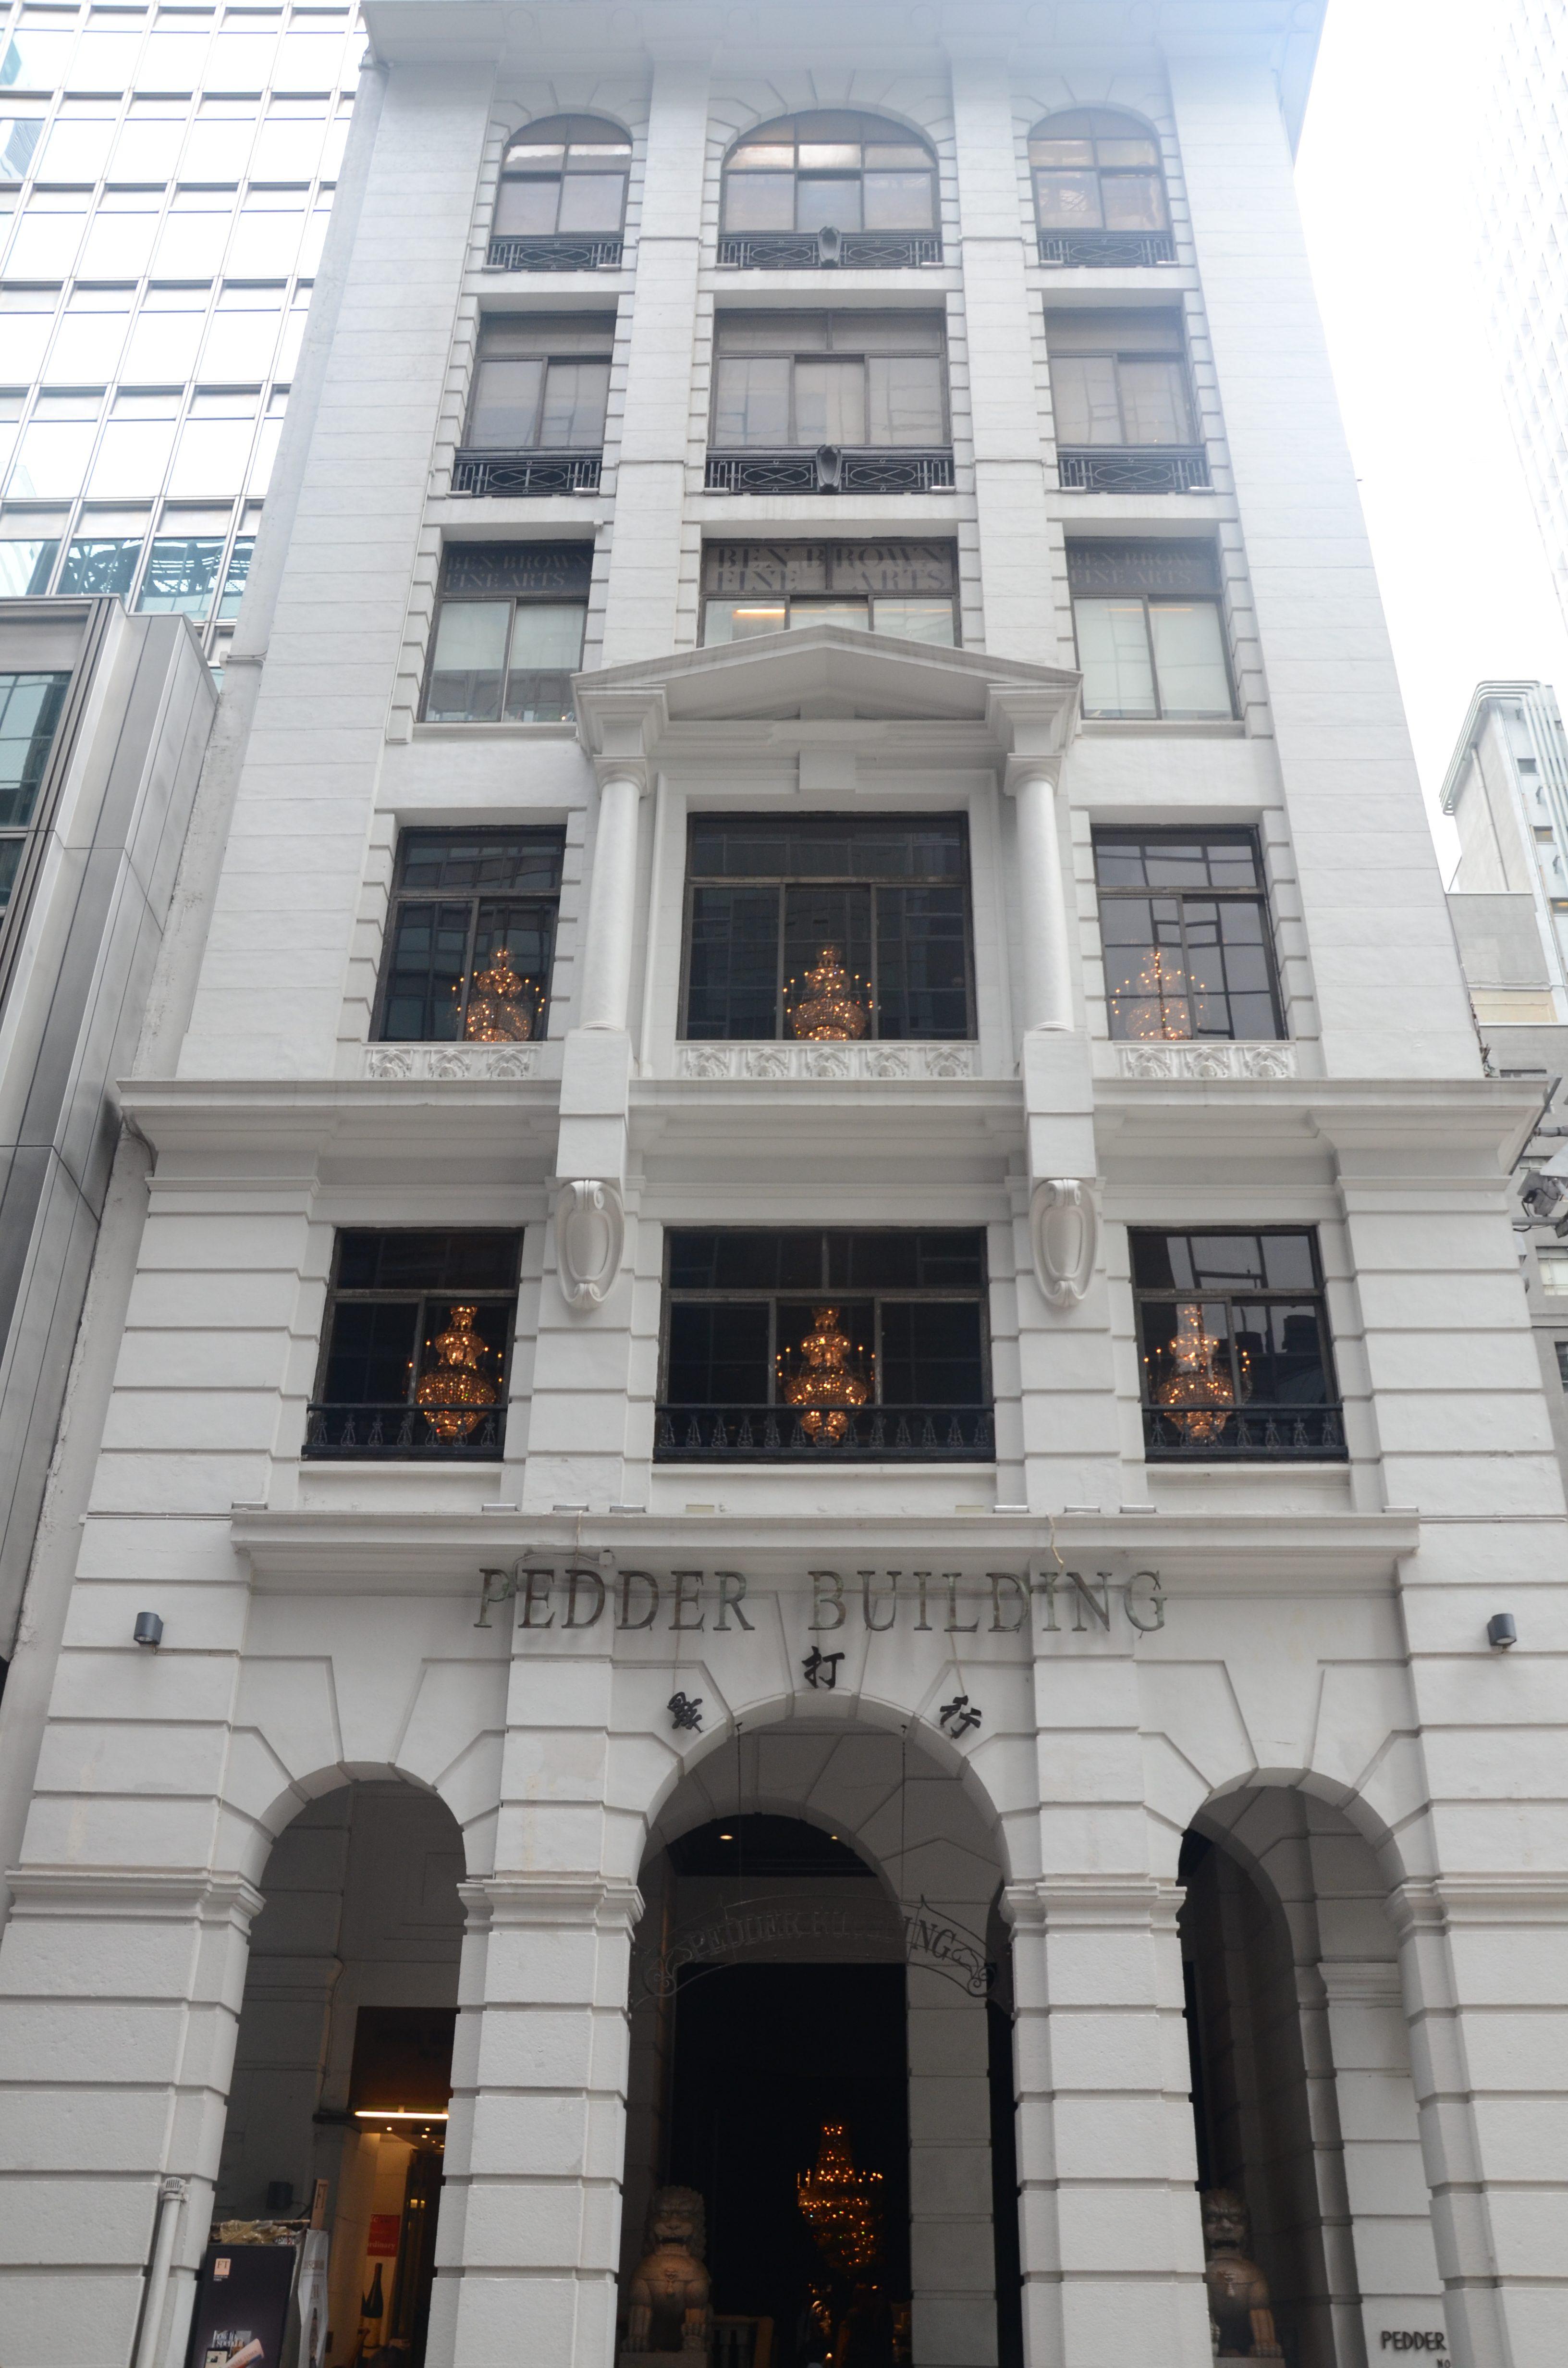 Pedder building exterior image